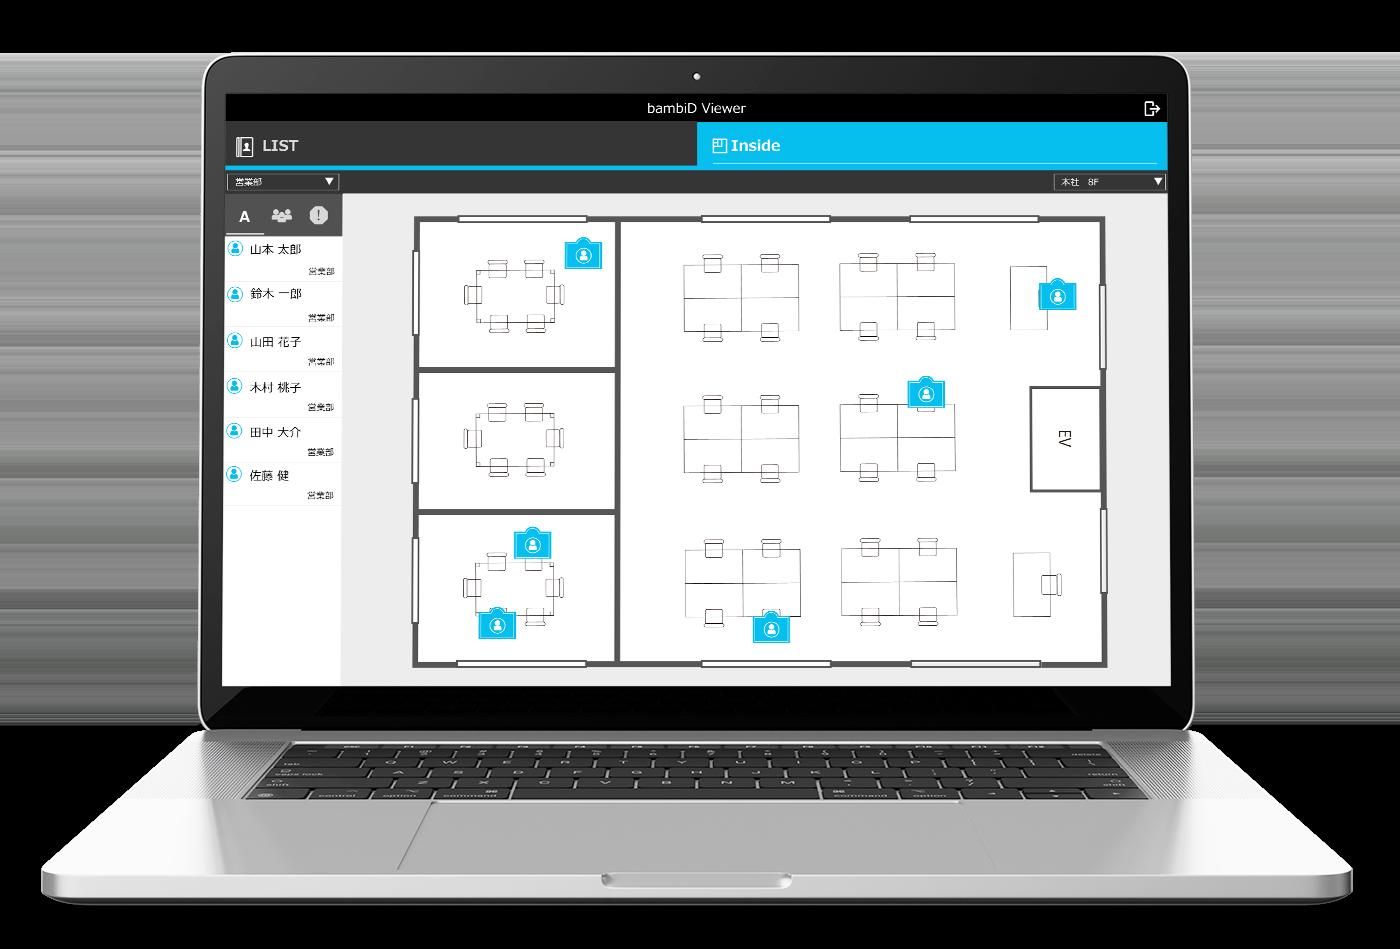 IoT 位置情報管理 アプリ bambiD Viewer